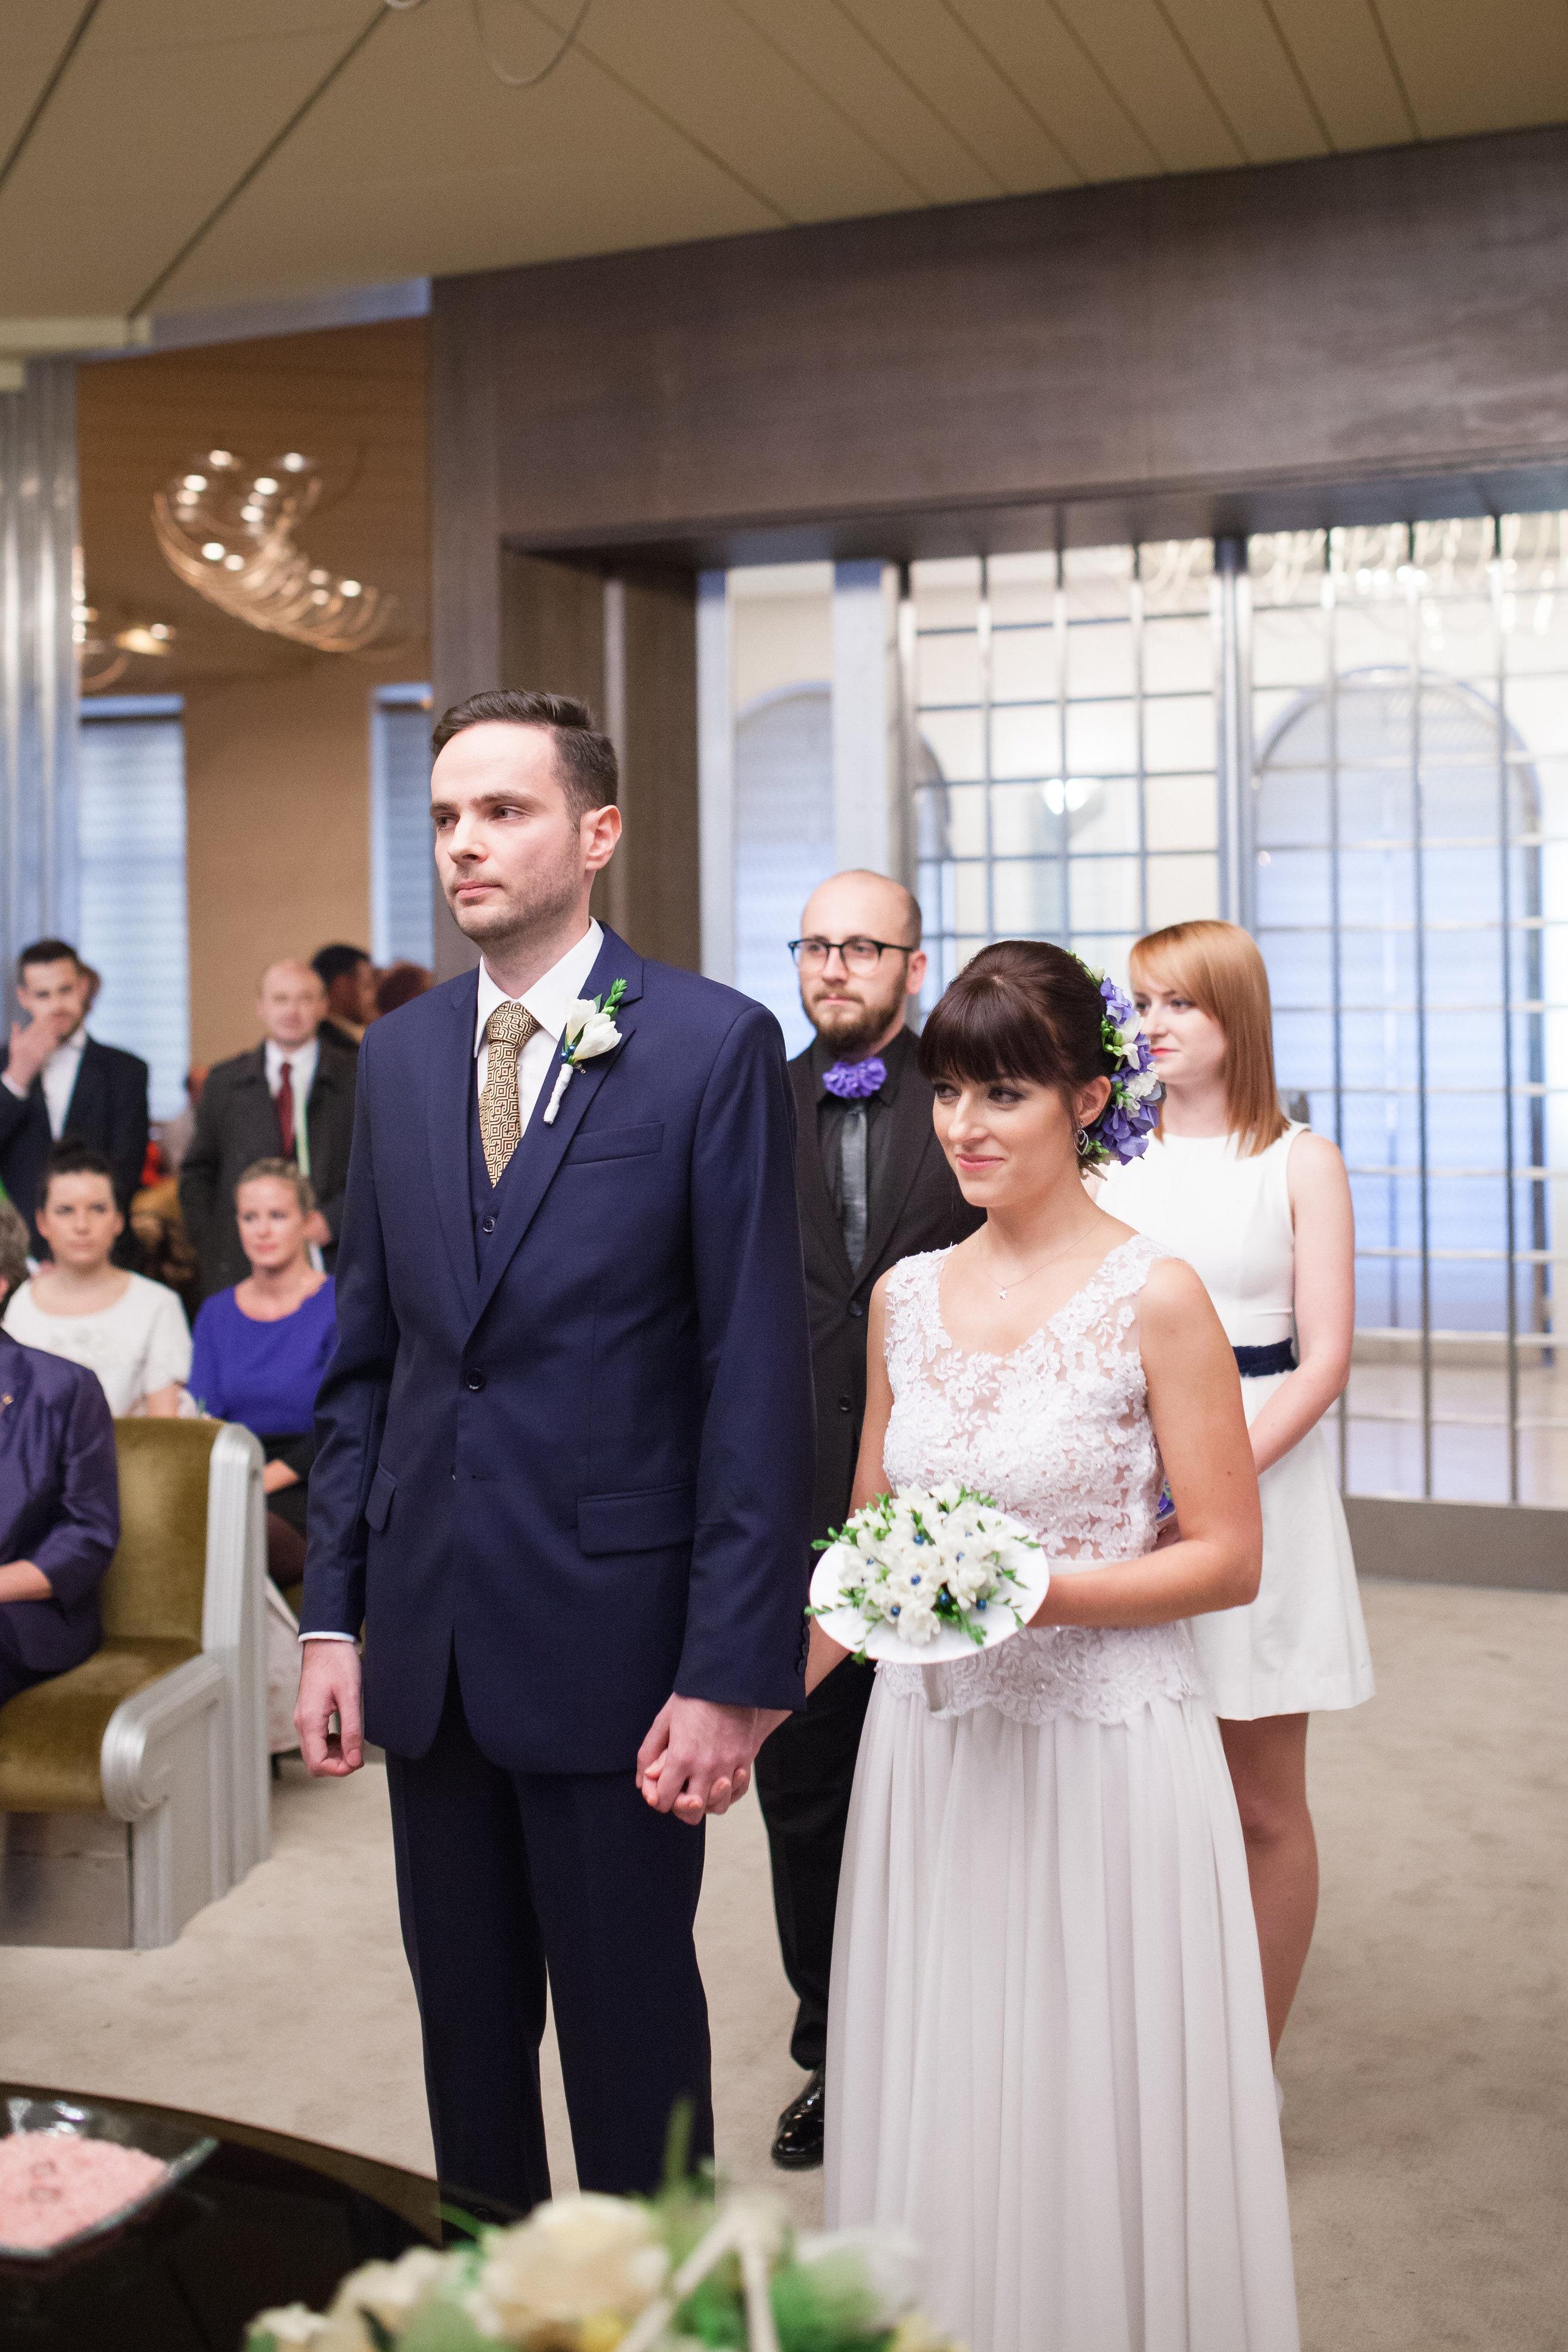 destination-wedding-photographer-bratislava-slovakia-europe-ceremony-documentary-1.jpg